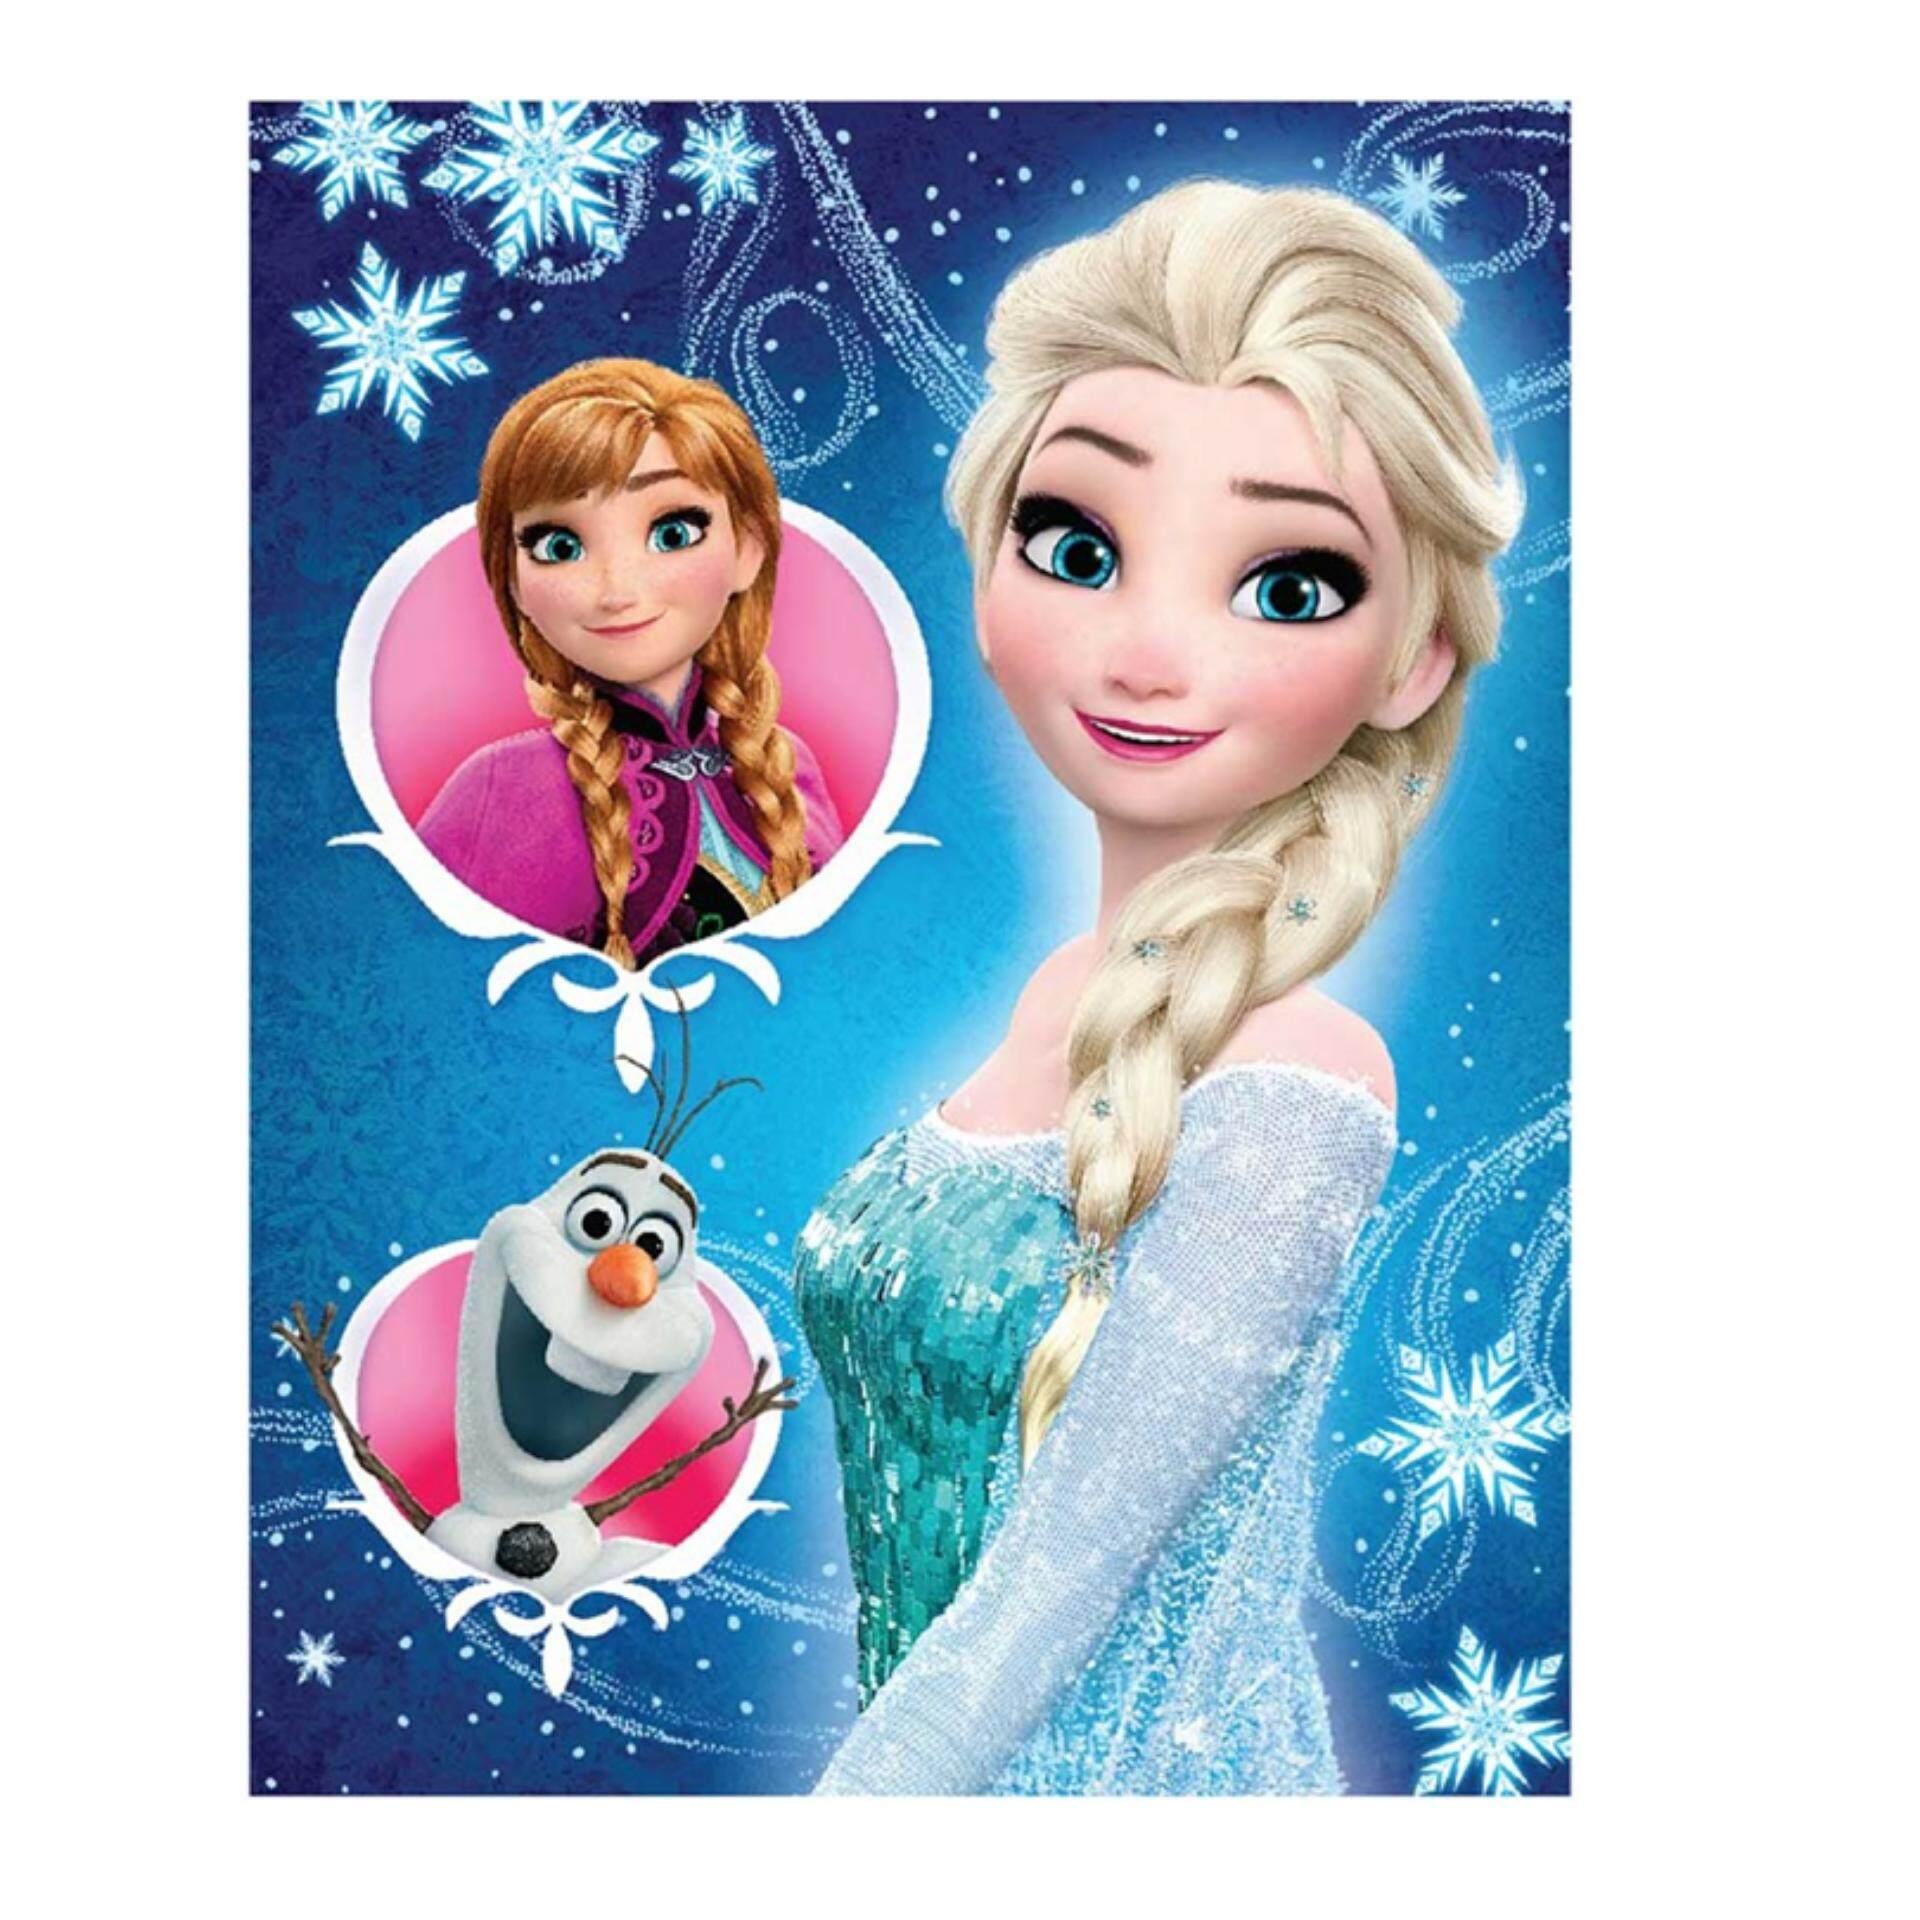 Disney Princess Frozen Exercise Book Set - Blue Colour